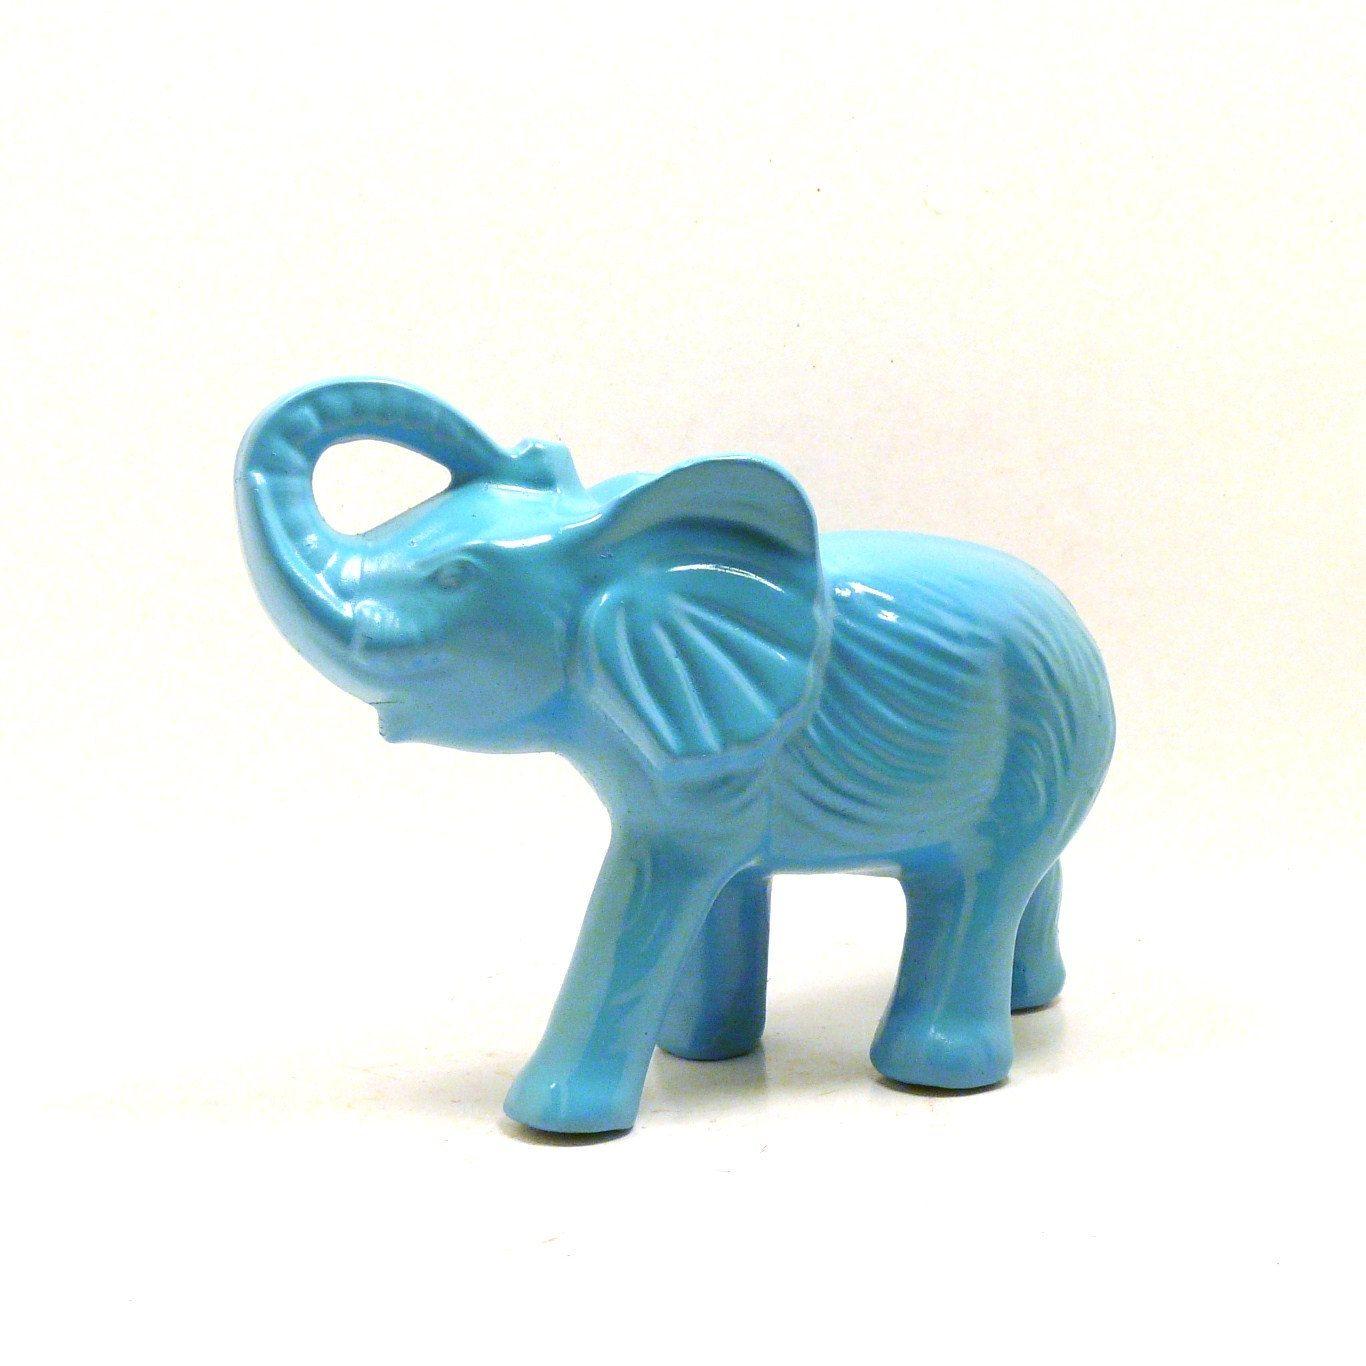 Bohemian elephant figurine // turquoise, home decor, painted ...